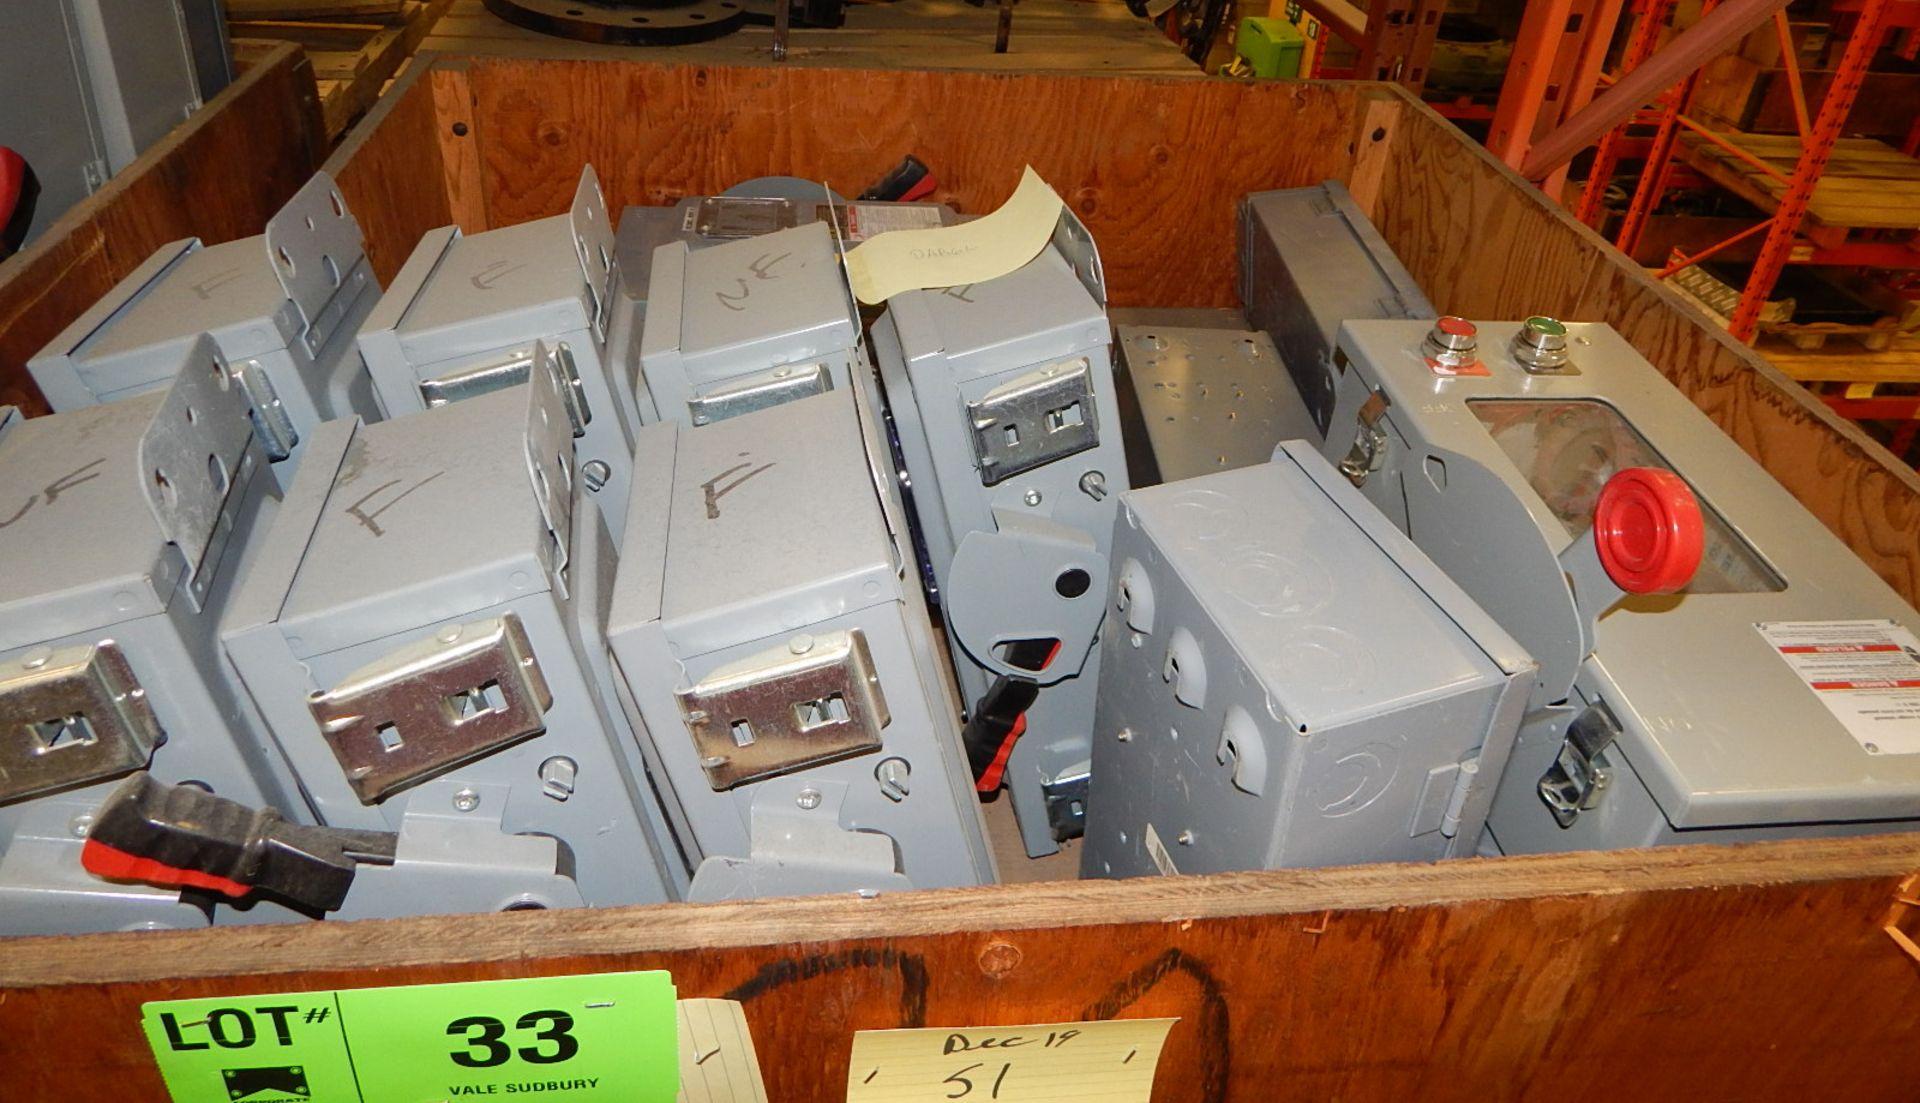 Lot 33 - LOT/ DISCONNECT BOXES (CMD)